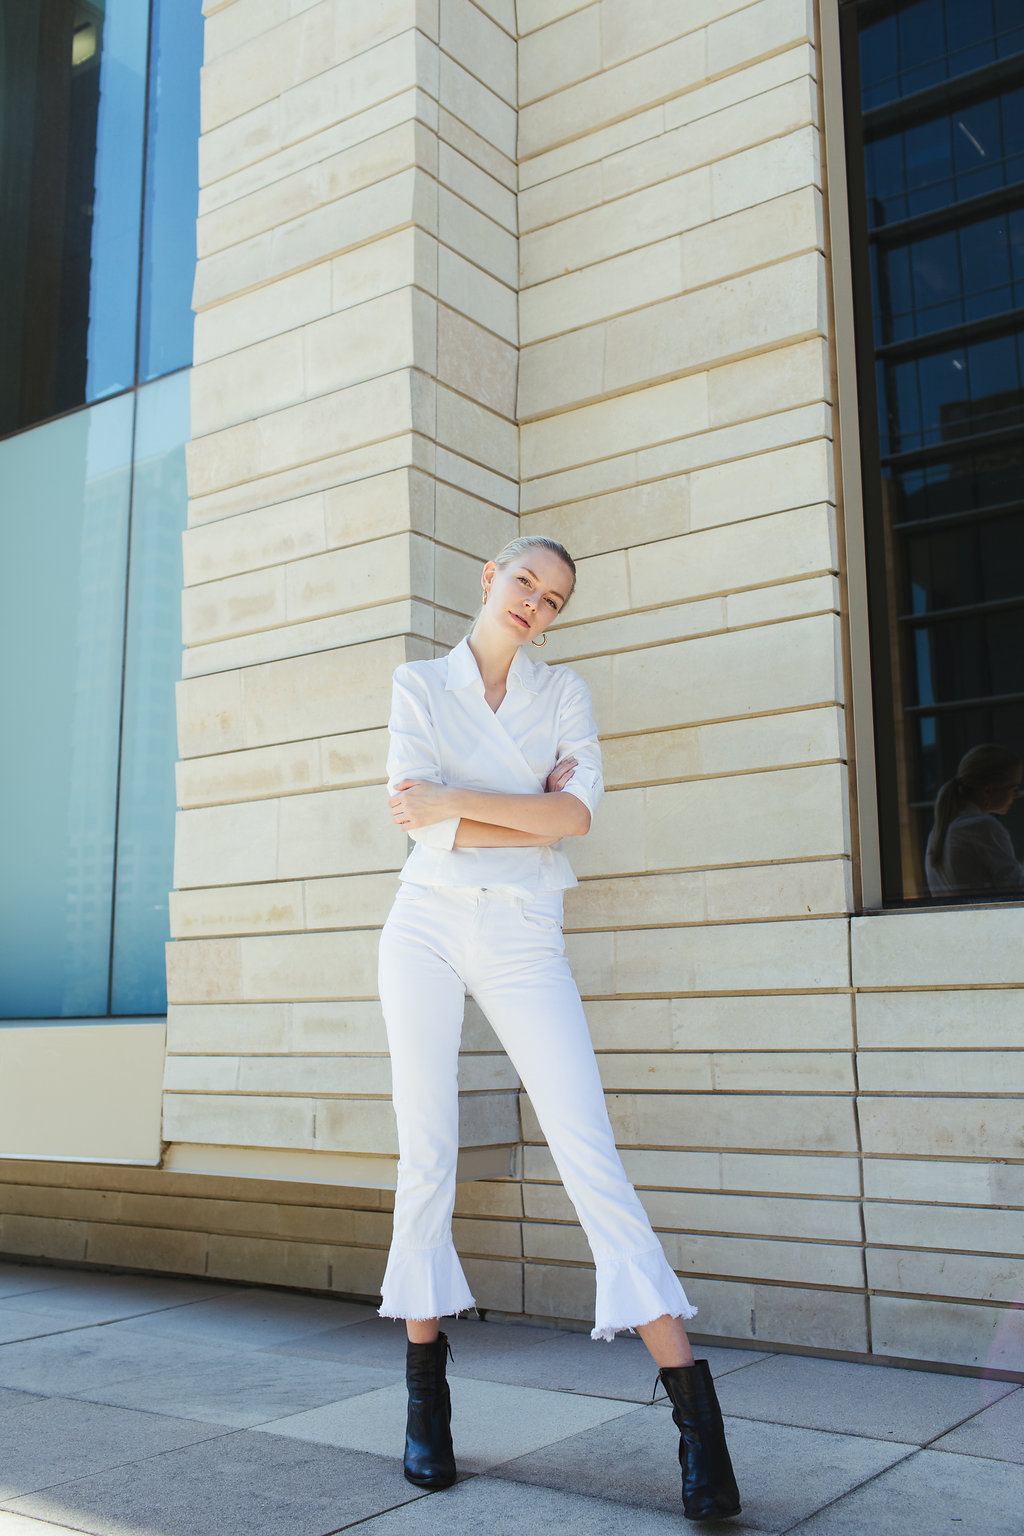 Paige-Newton-Austin-Model-Fashion-Photography0008.jpg